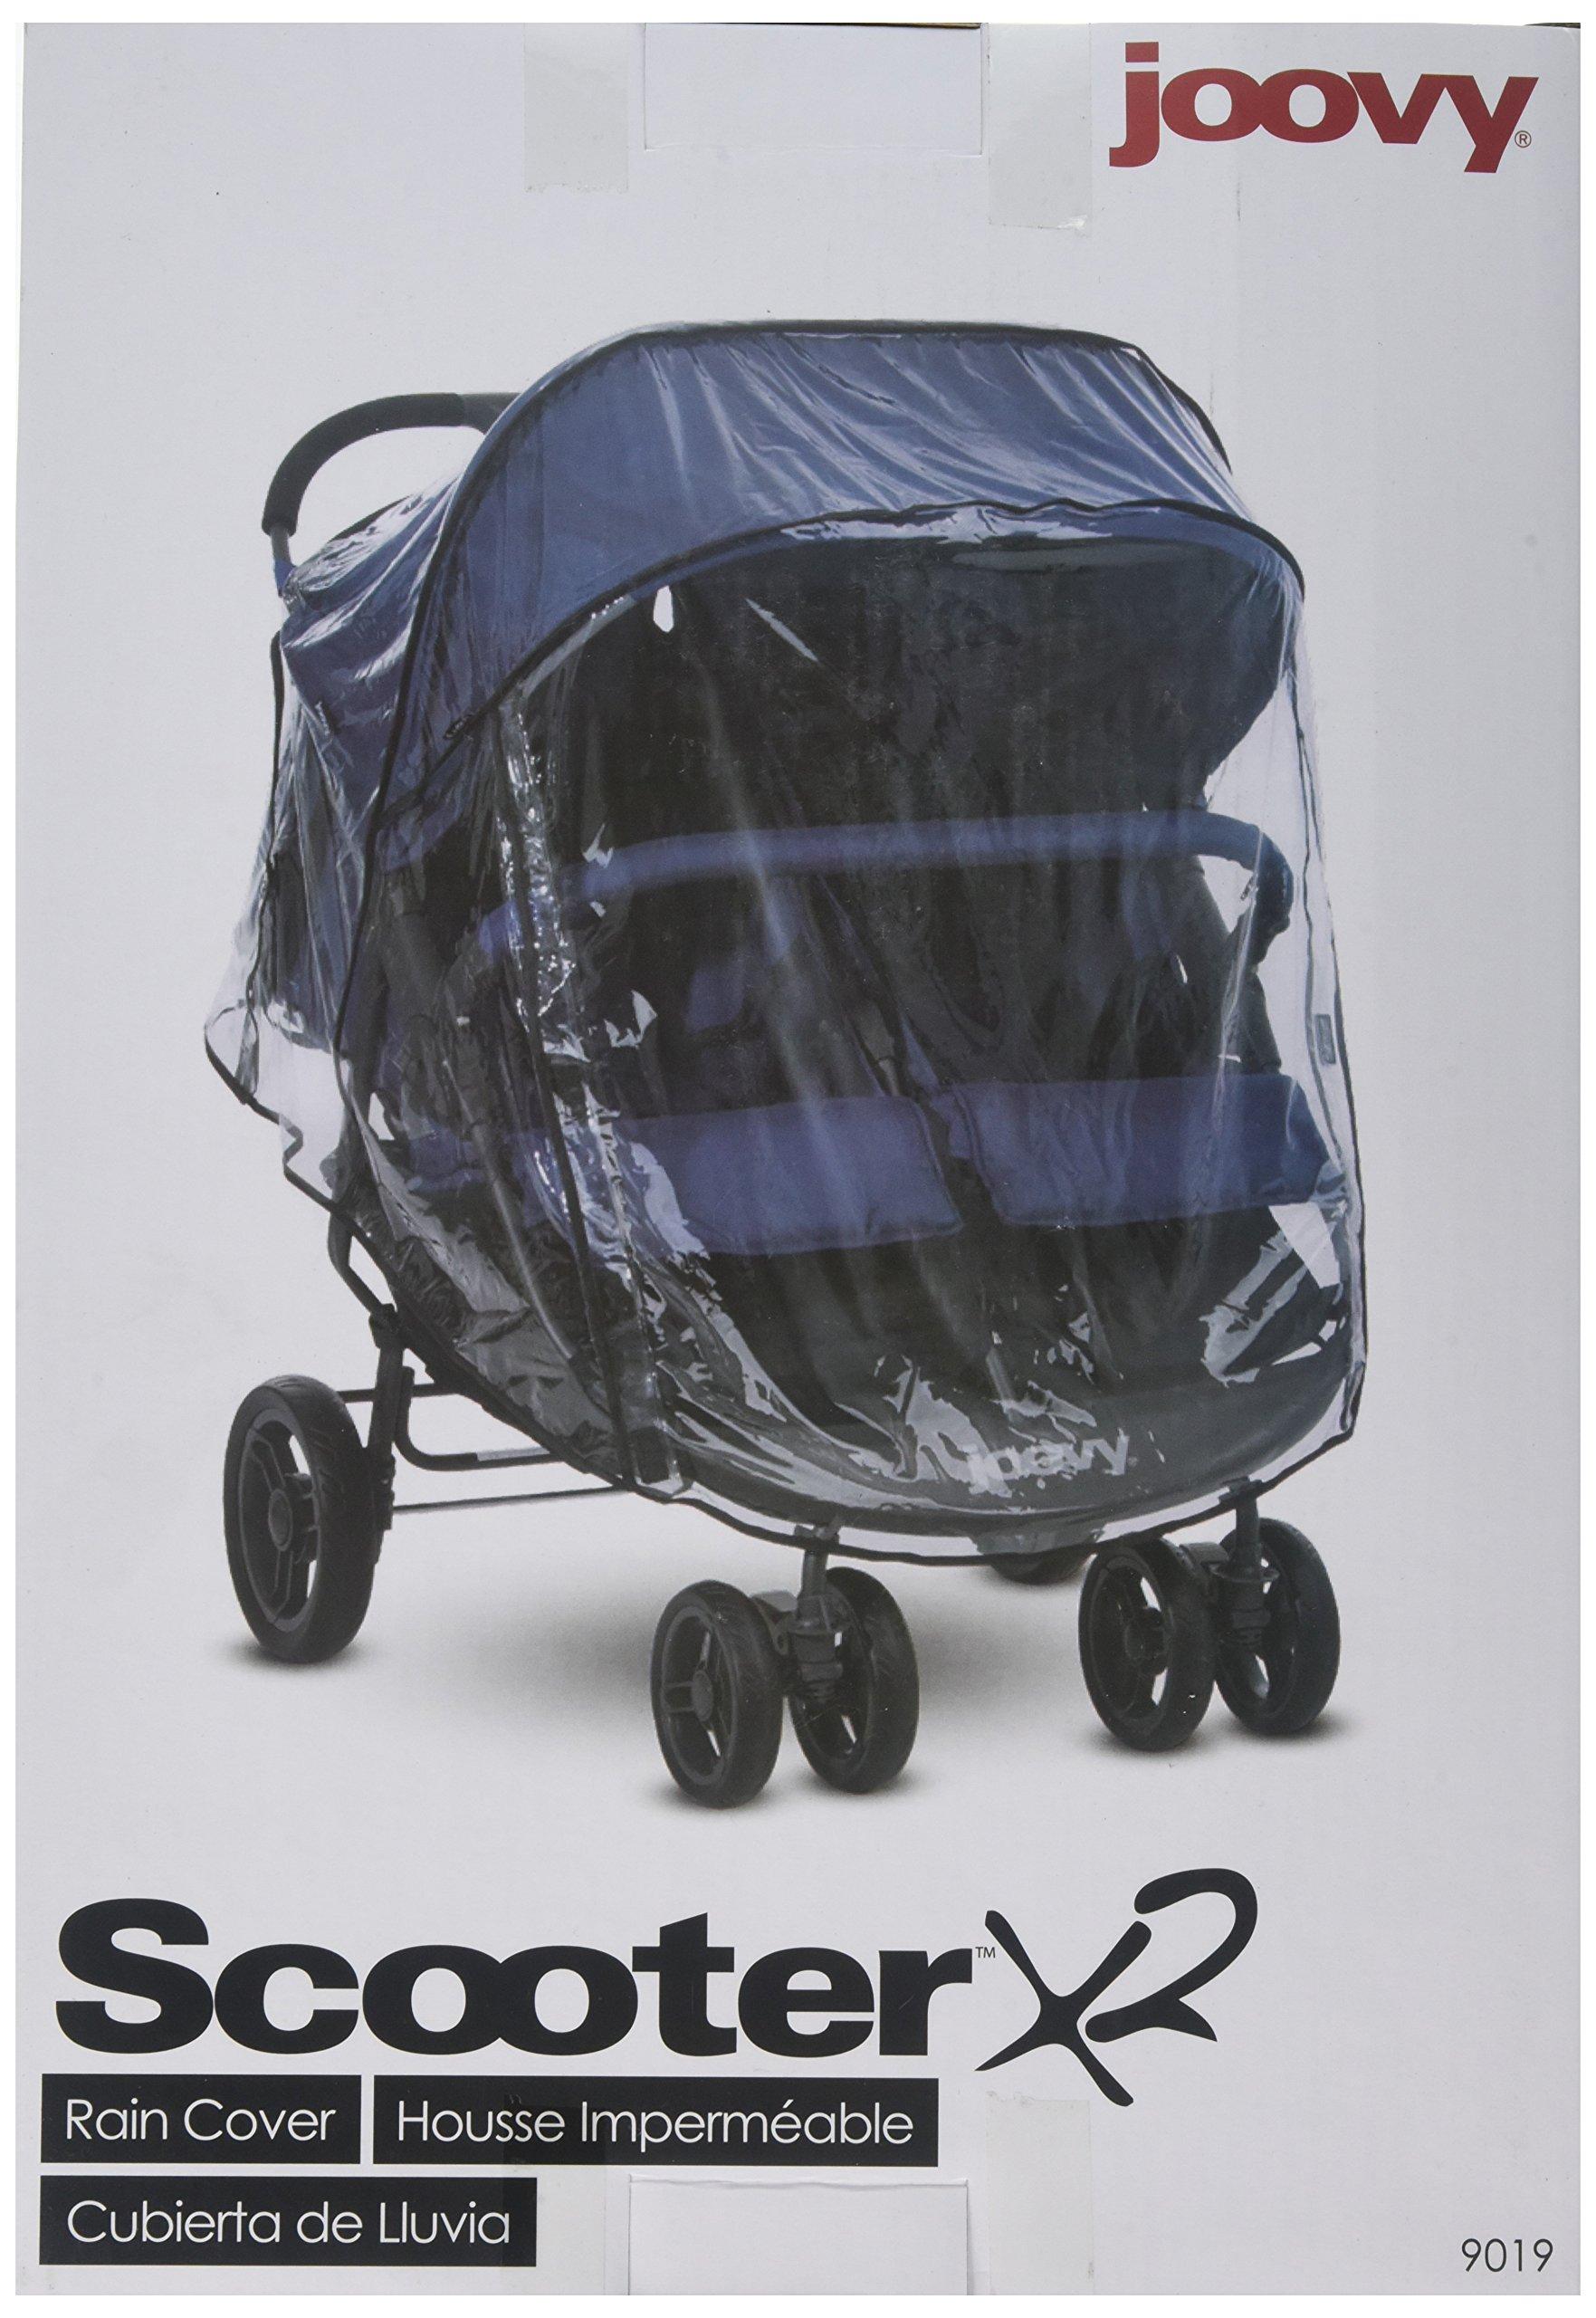 Amazon.com : JOOVY Scooter X2 Rain Cover : Baby